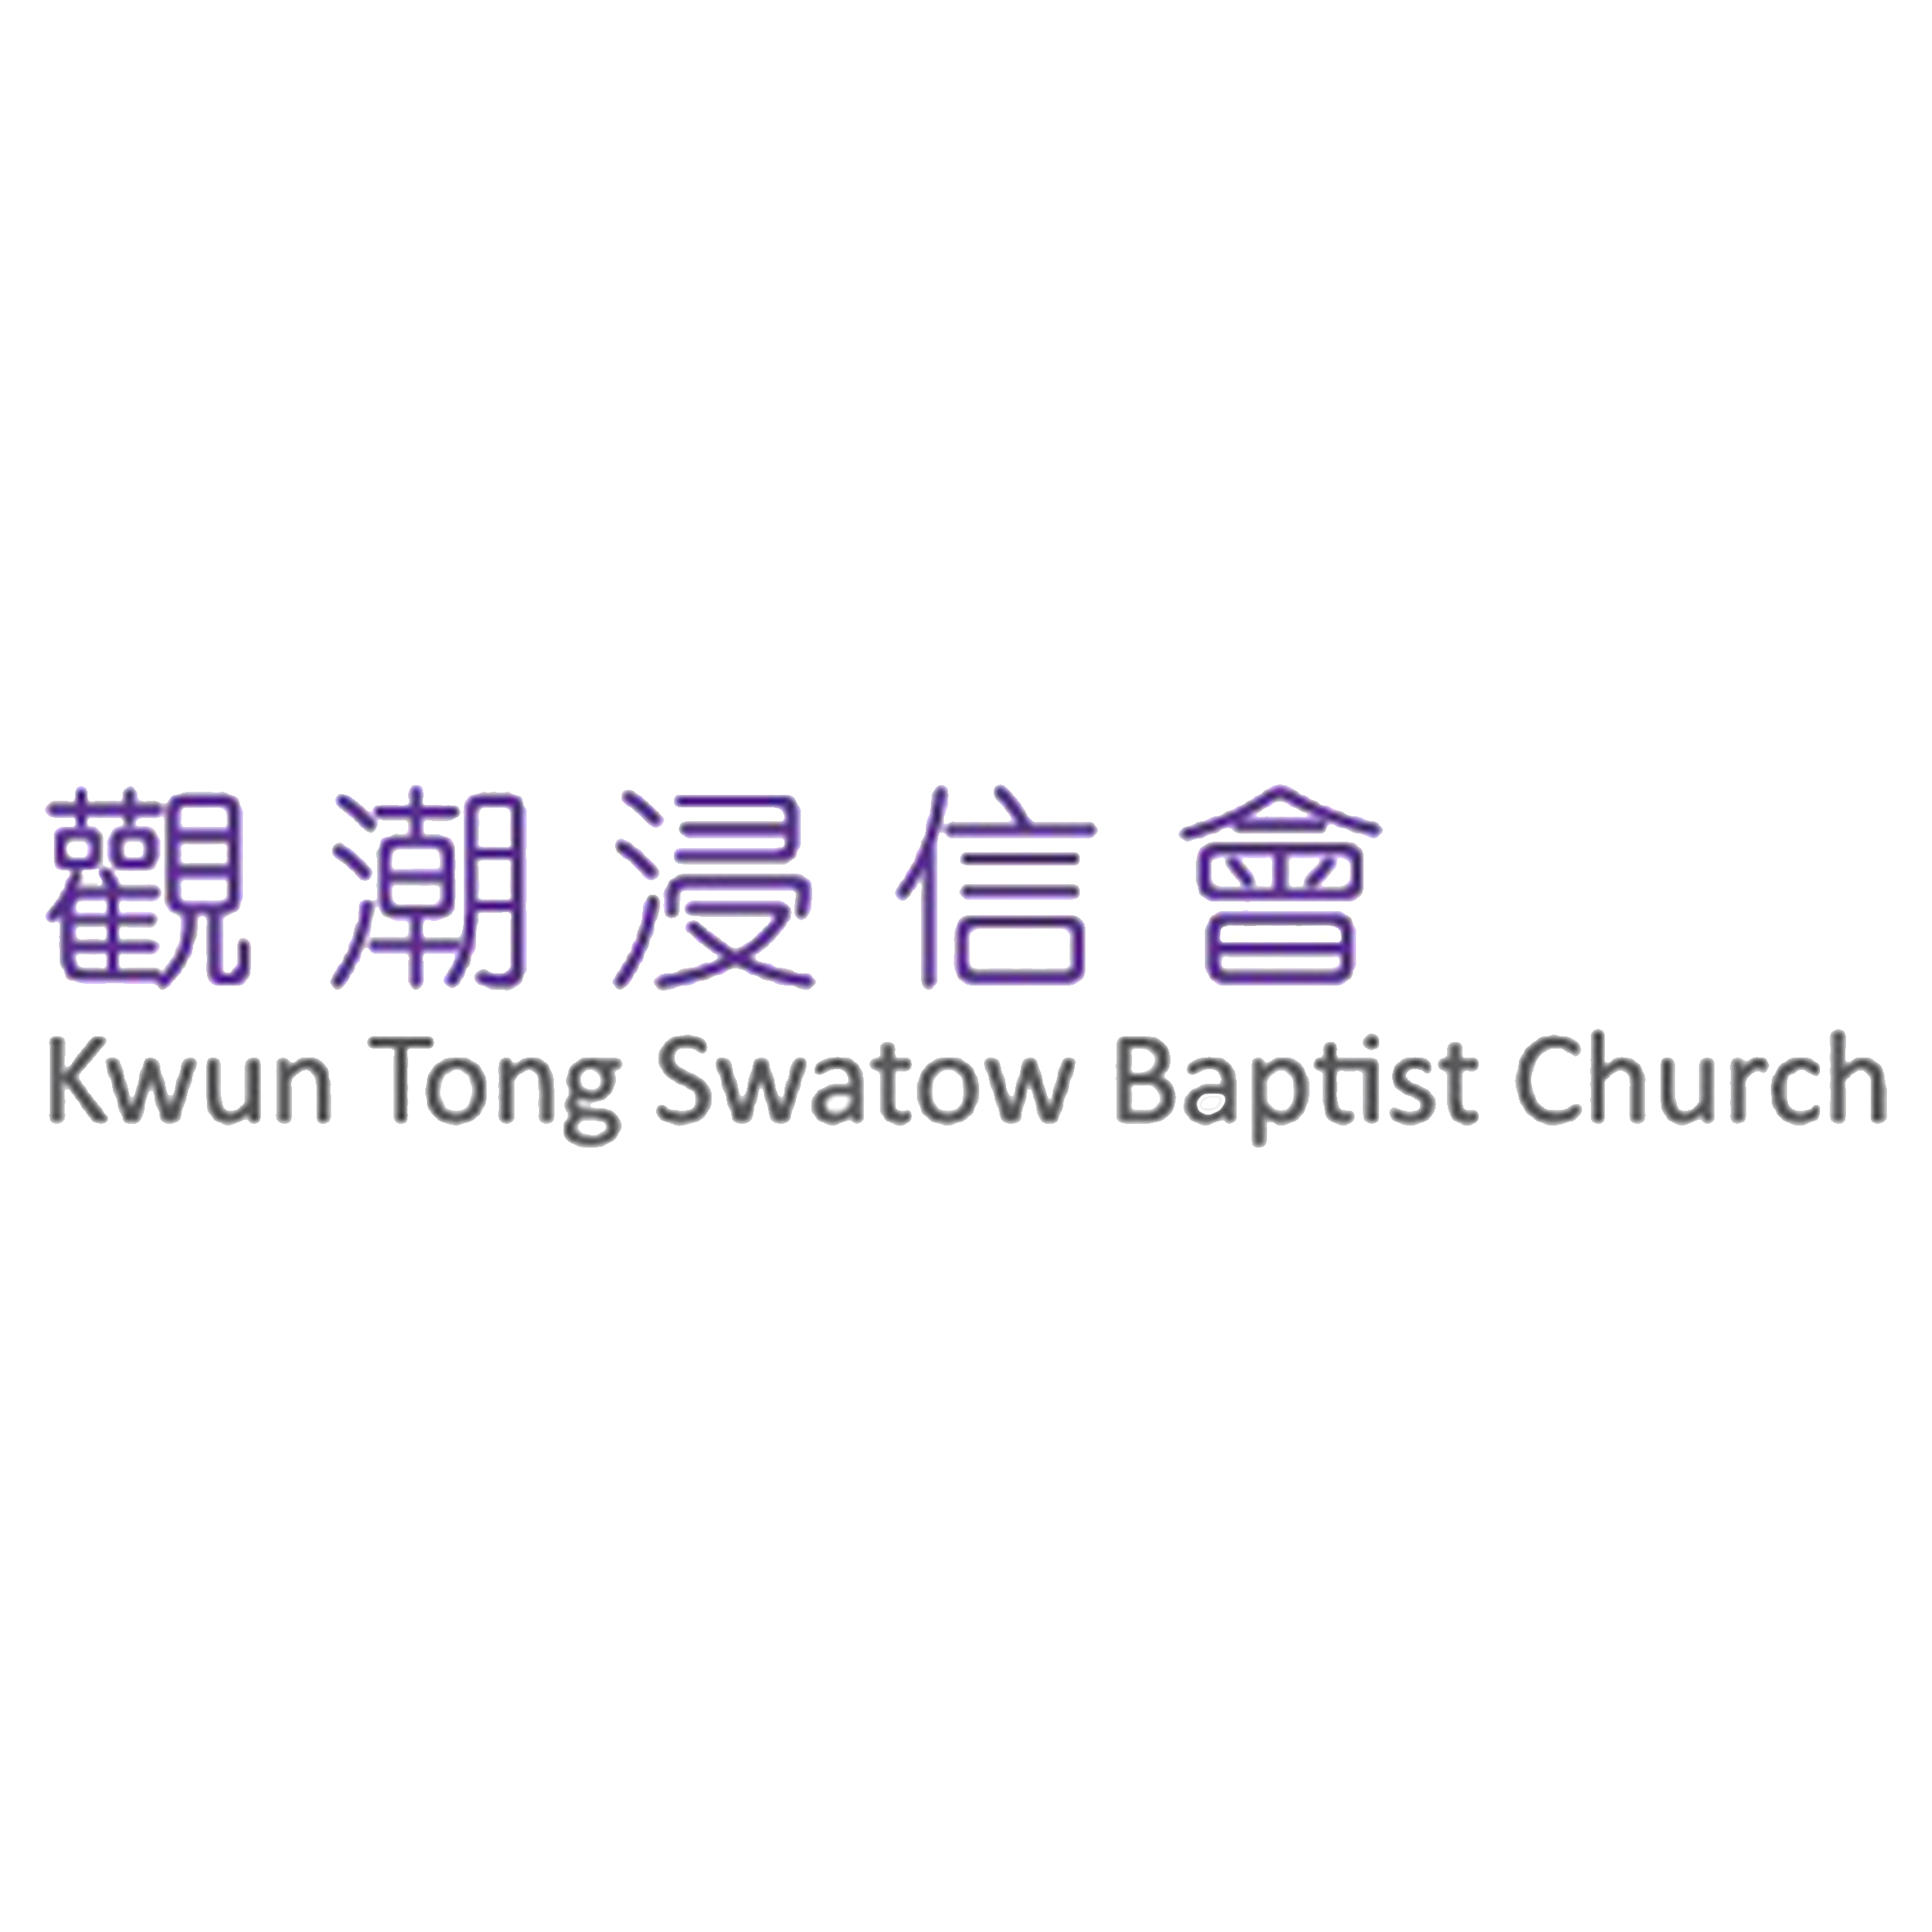 Kwun Tong Swatow Baptist Church